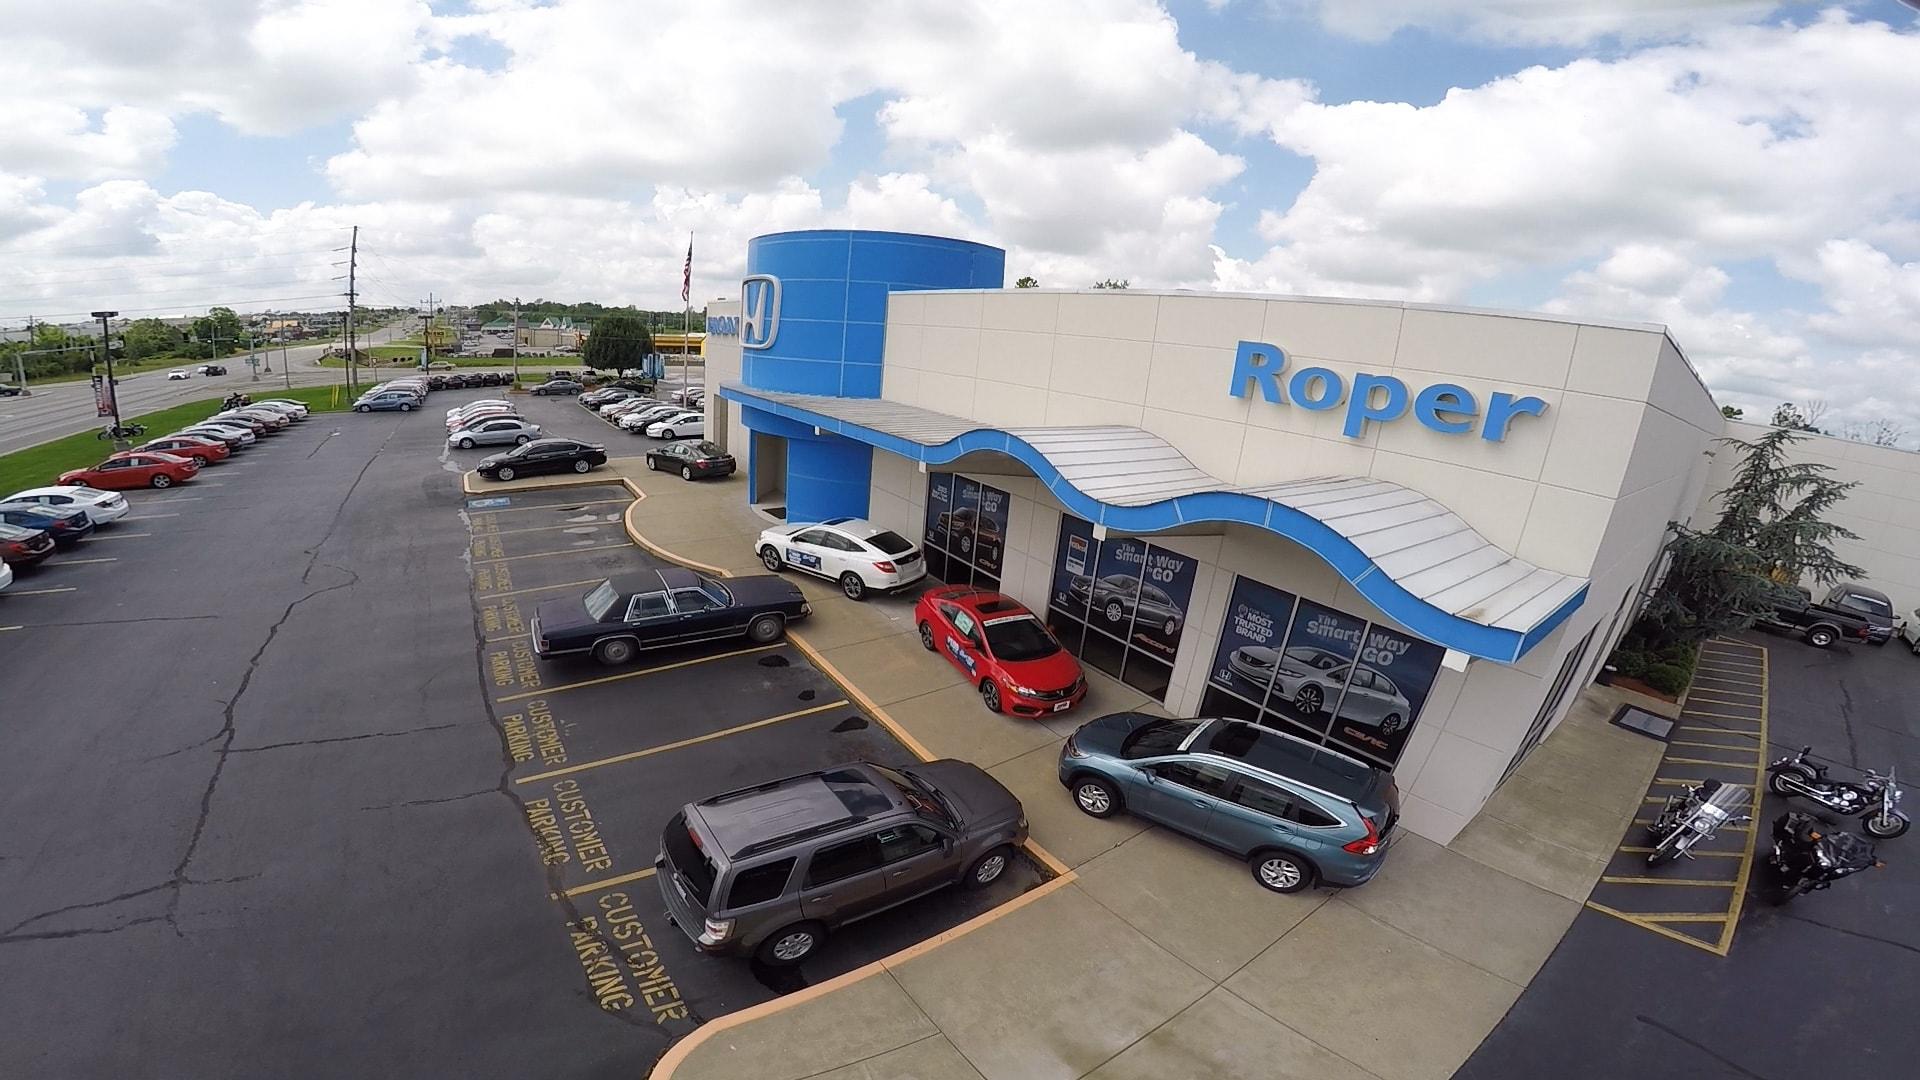 About roper honda in joplin honda dealer near springfield mo for Honda dealer springfield